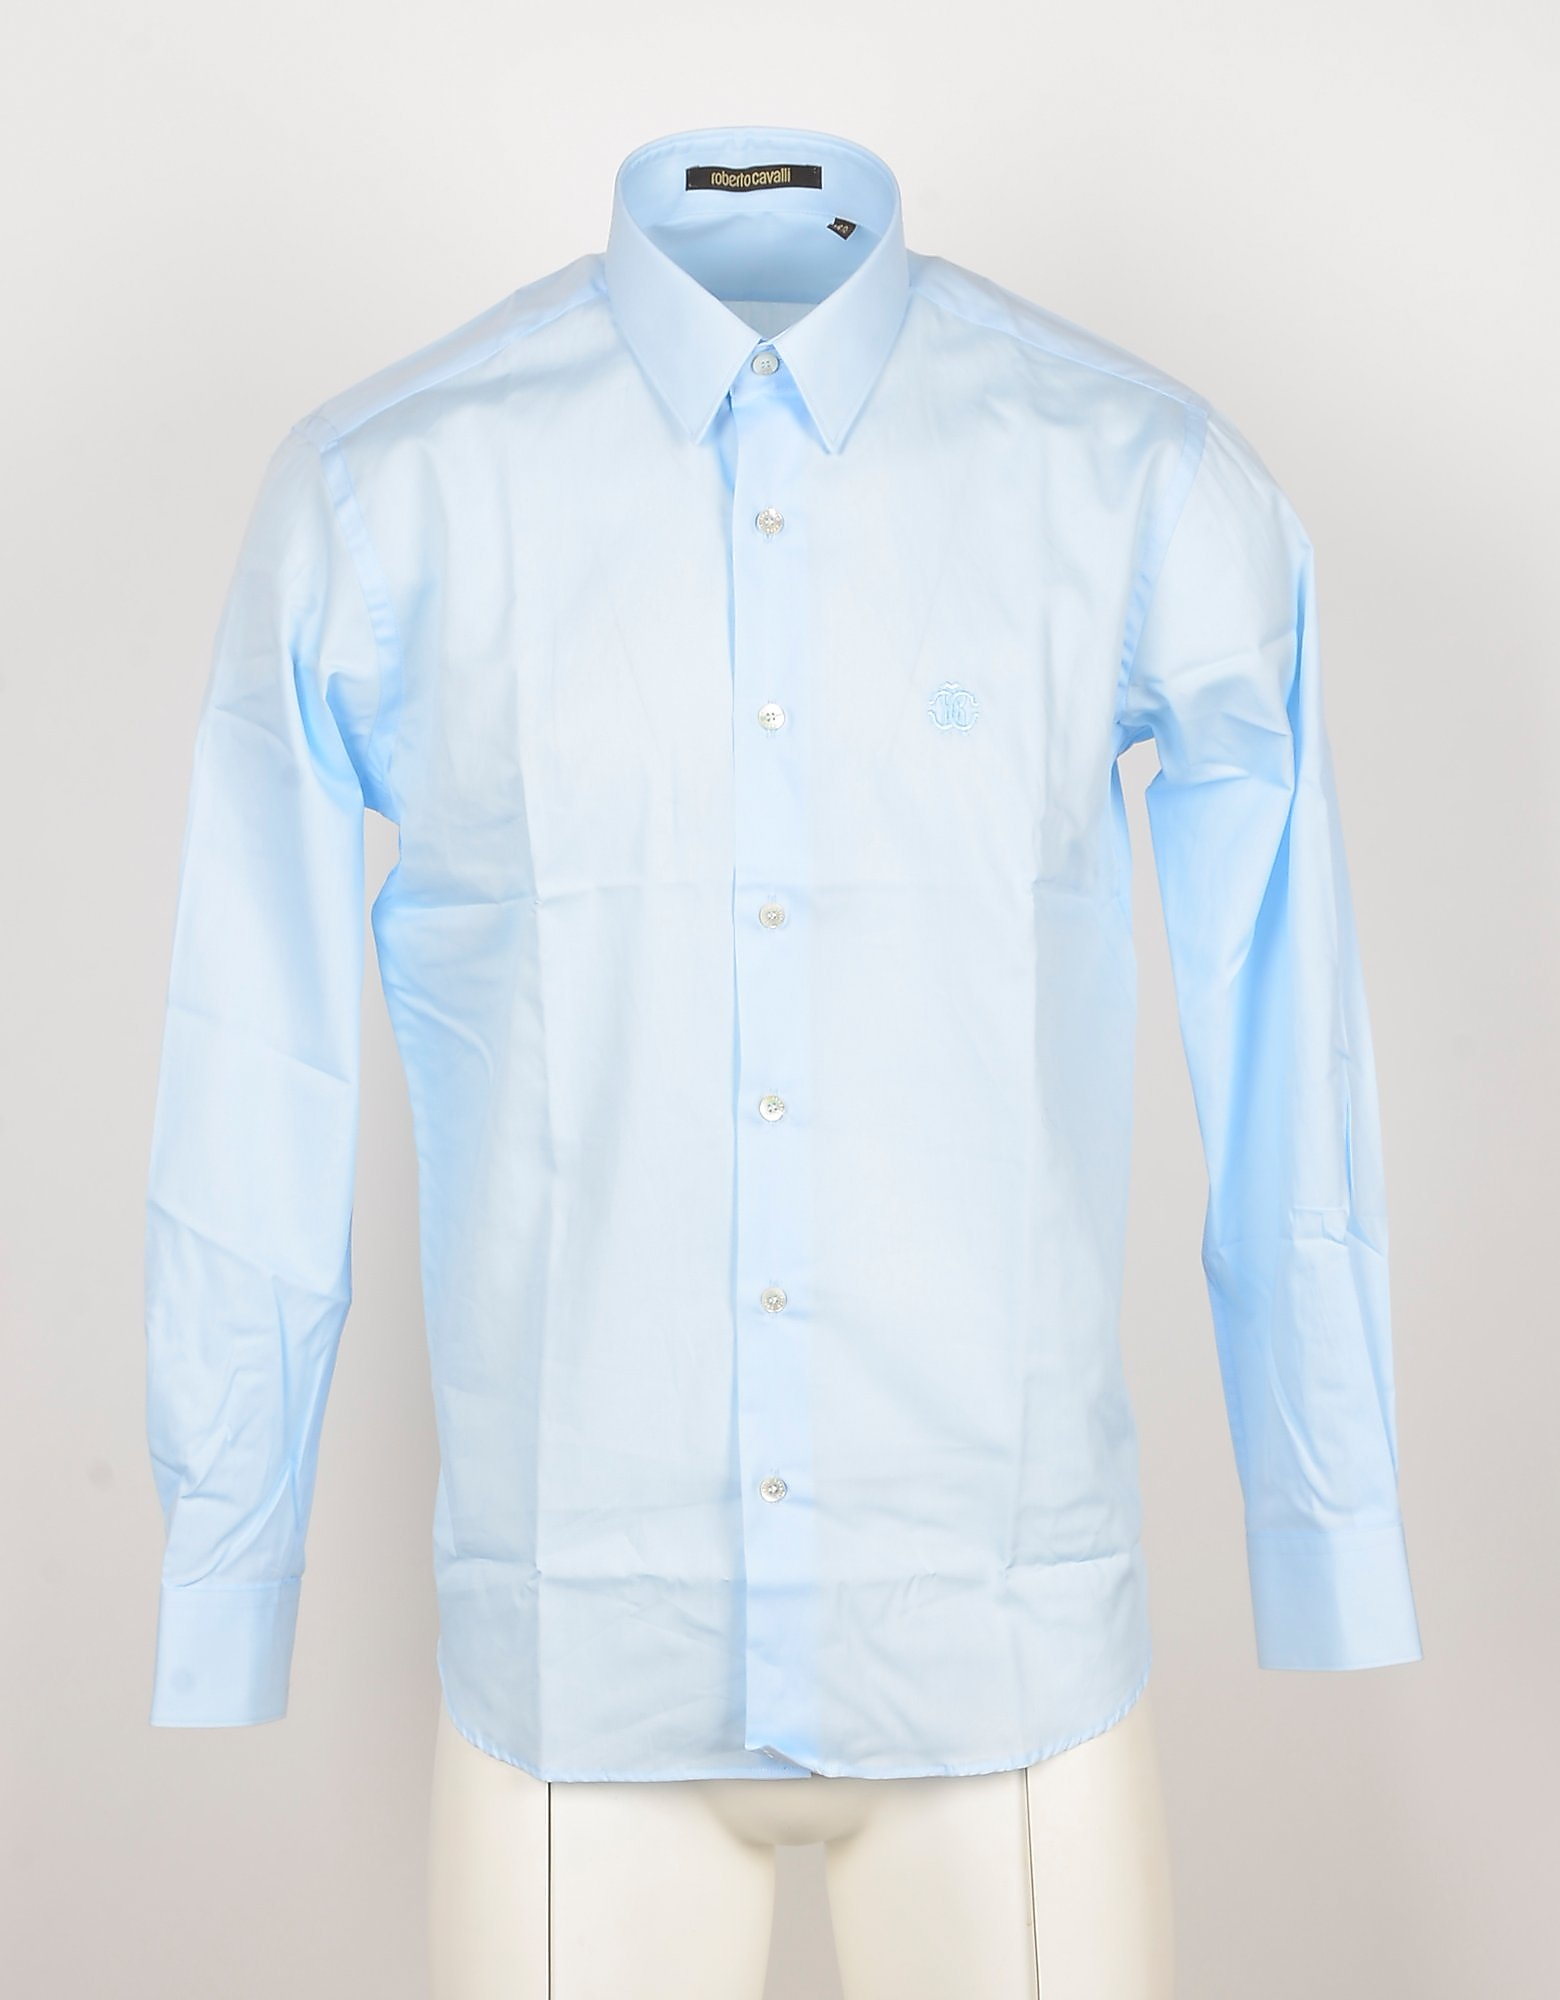 Roberto Cavalli Designer Shirts, Light Blue Cotton Men's Shirt